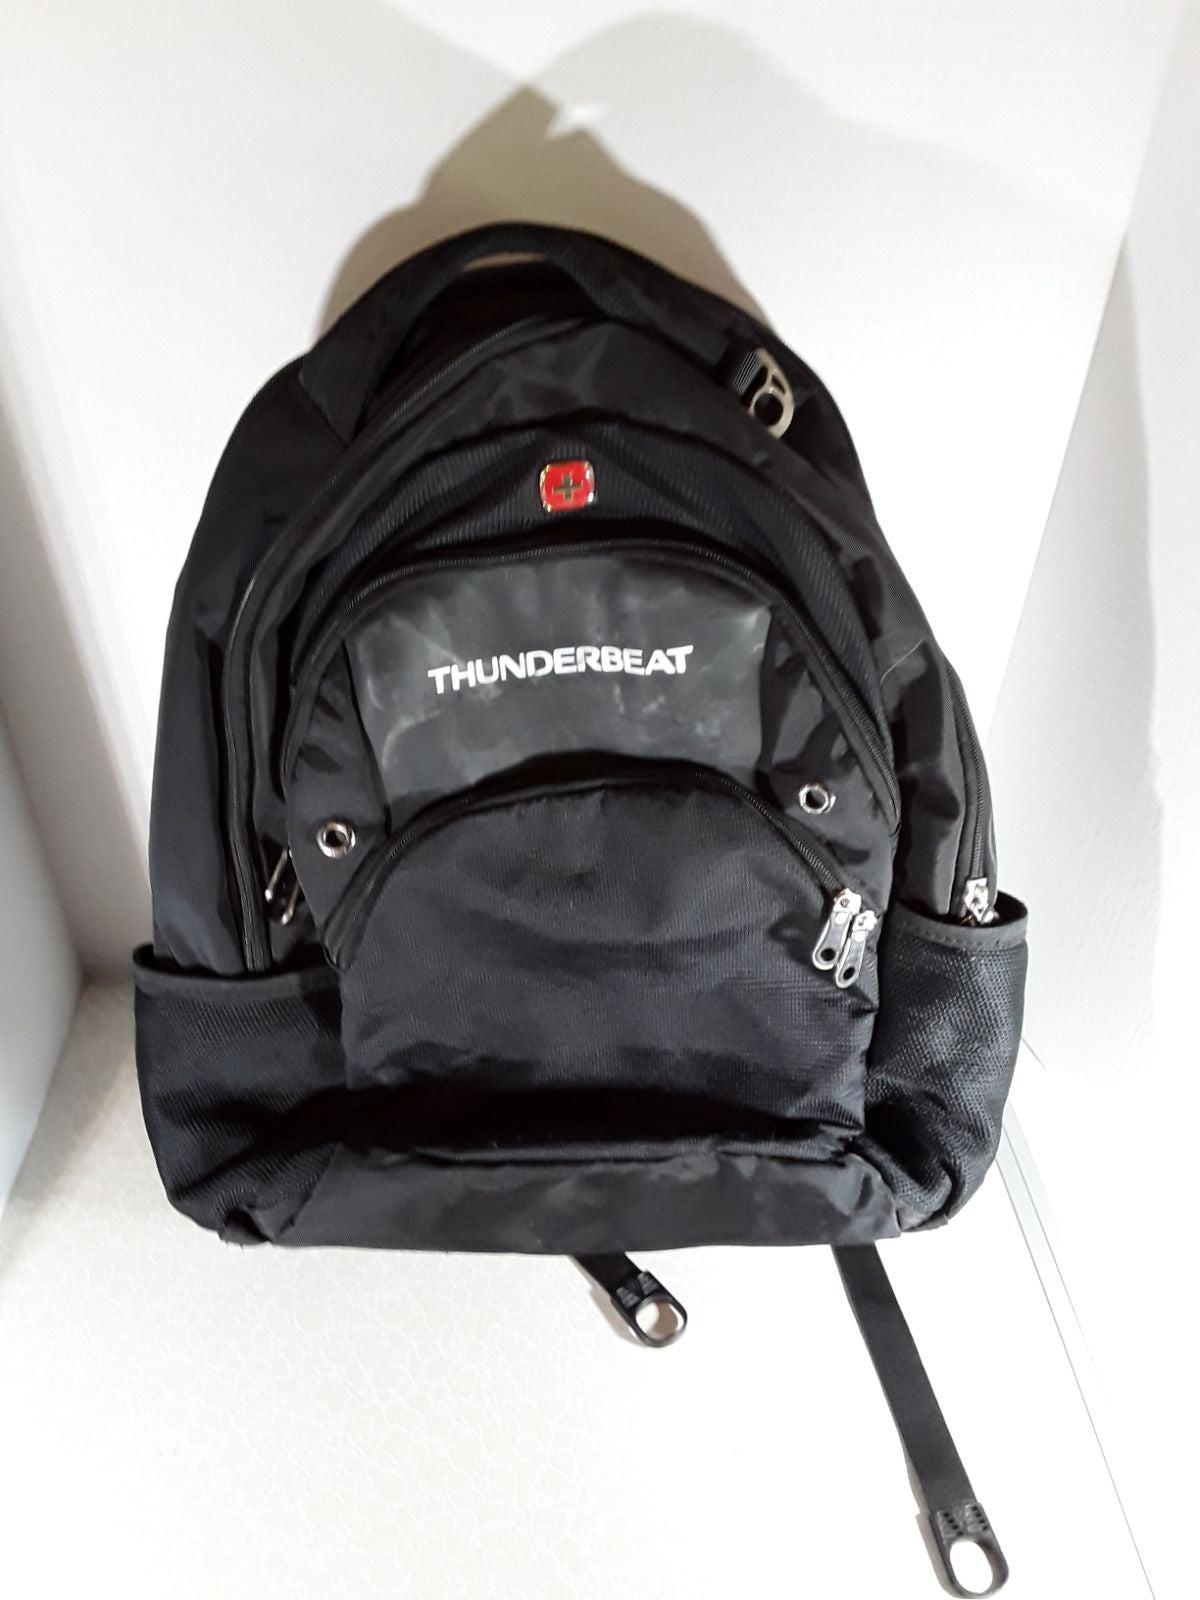 Swiss Gear Wenger Thunderbeat Backpack